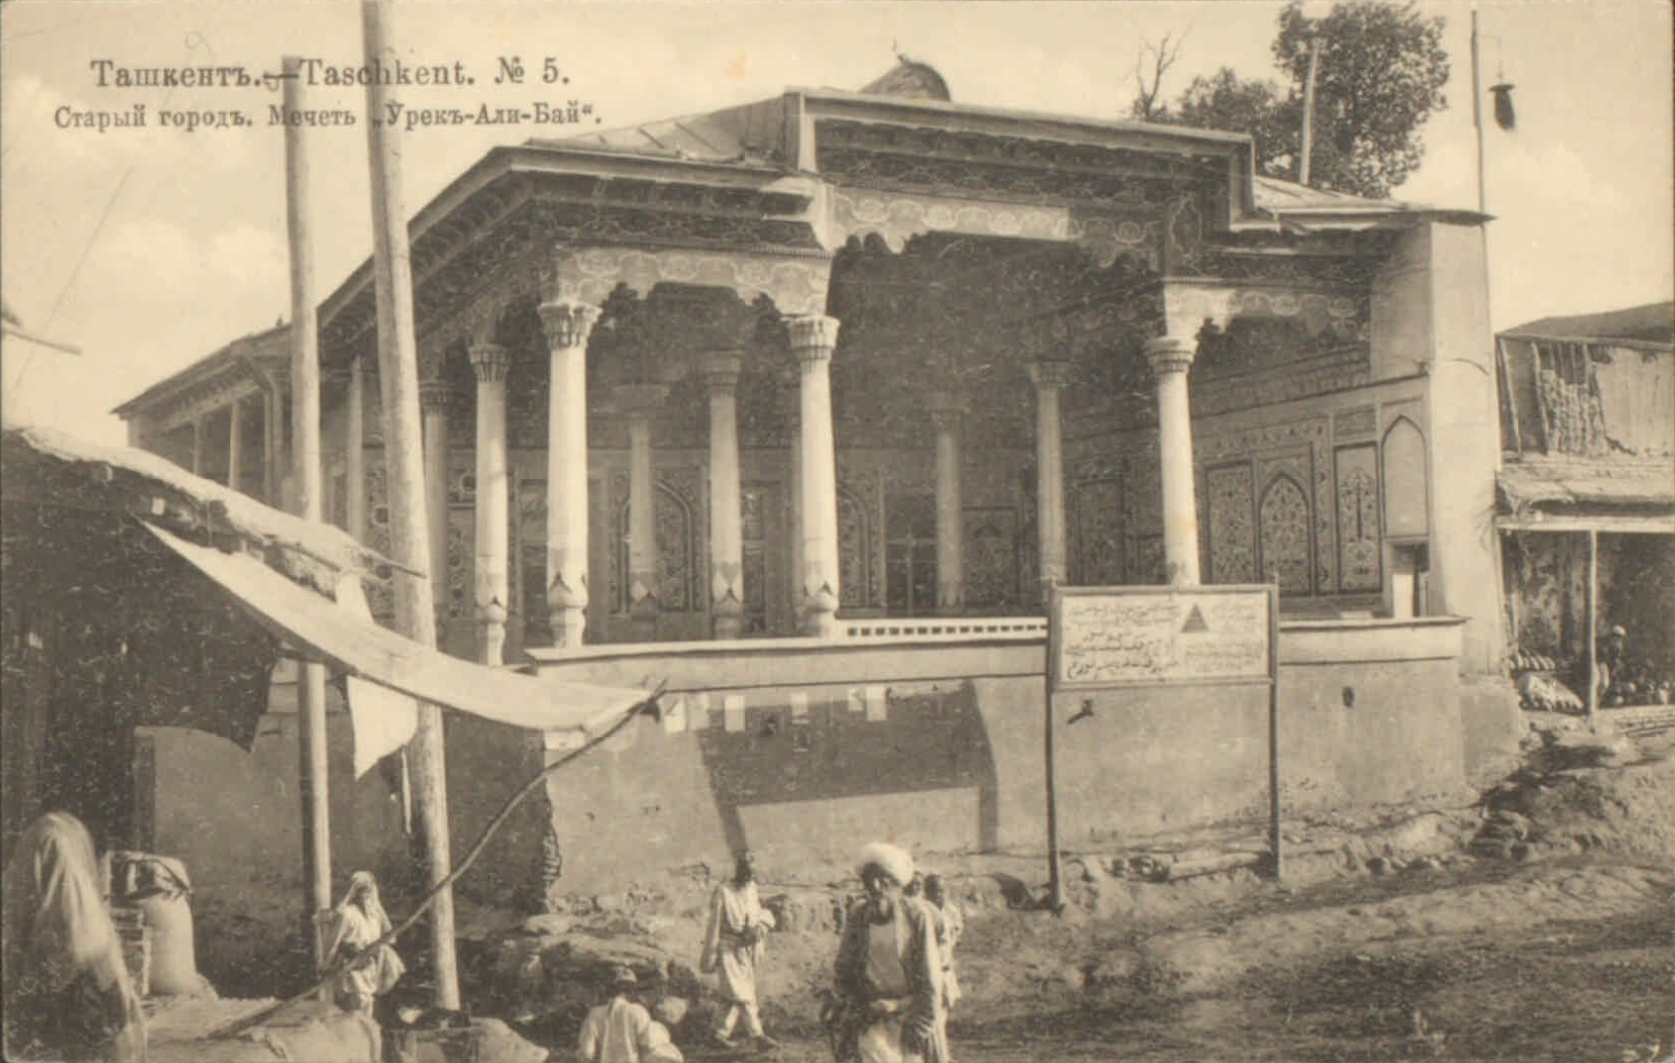 Мечеть «Урек-Али-Бай»